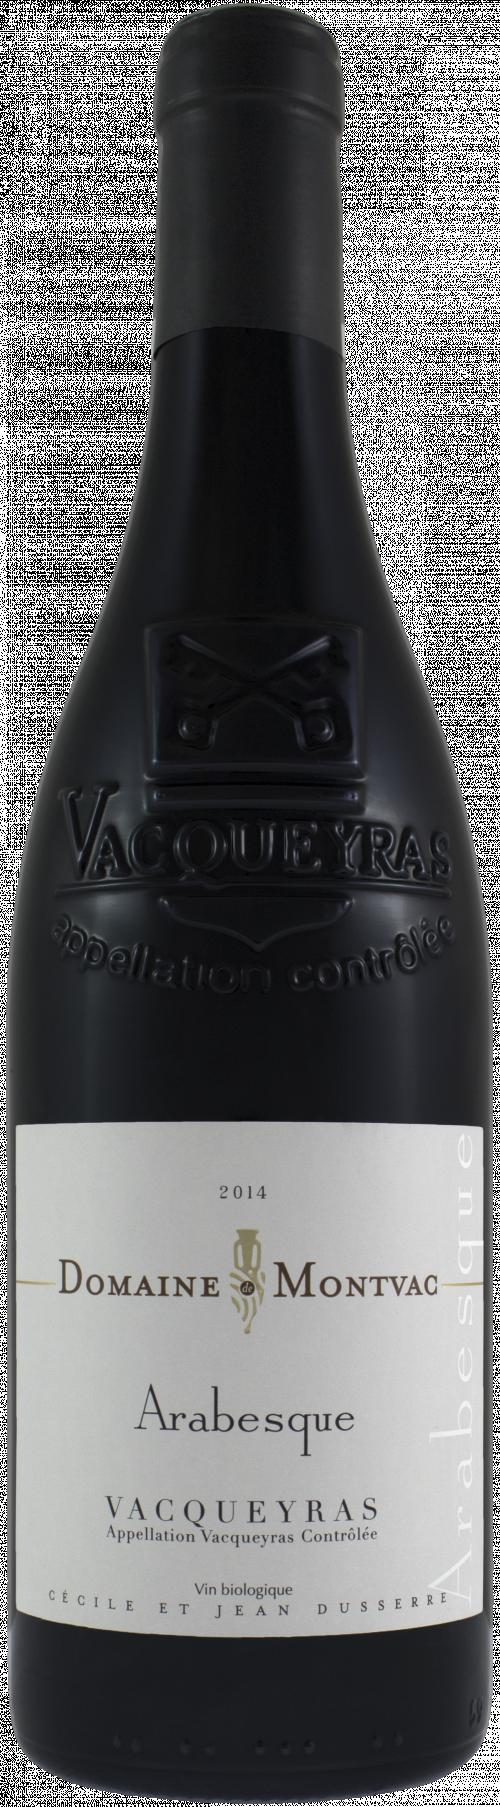 2017 Domaine De Montvac Vacqueyras Arabesque 750ml